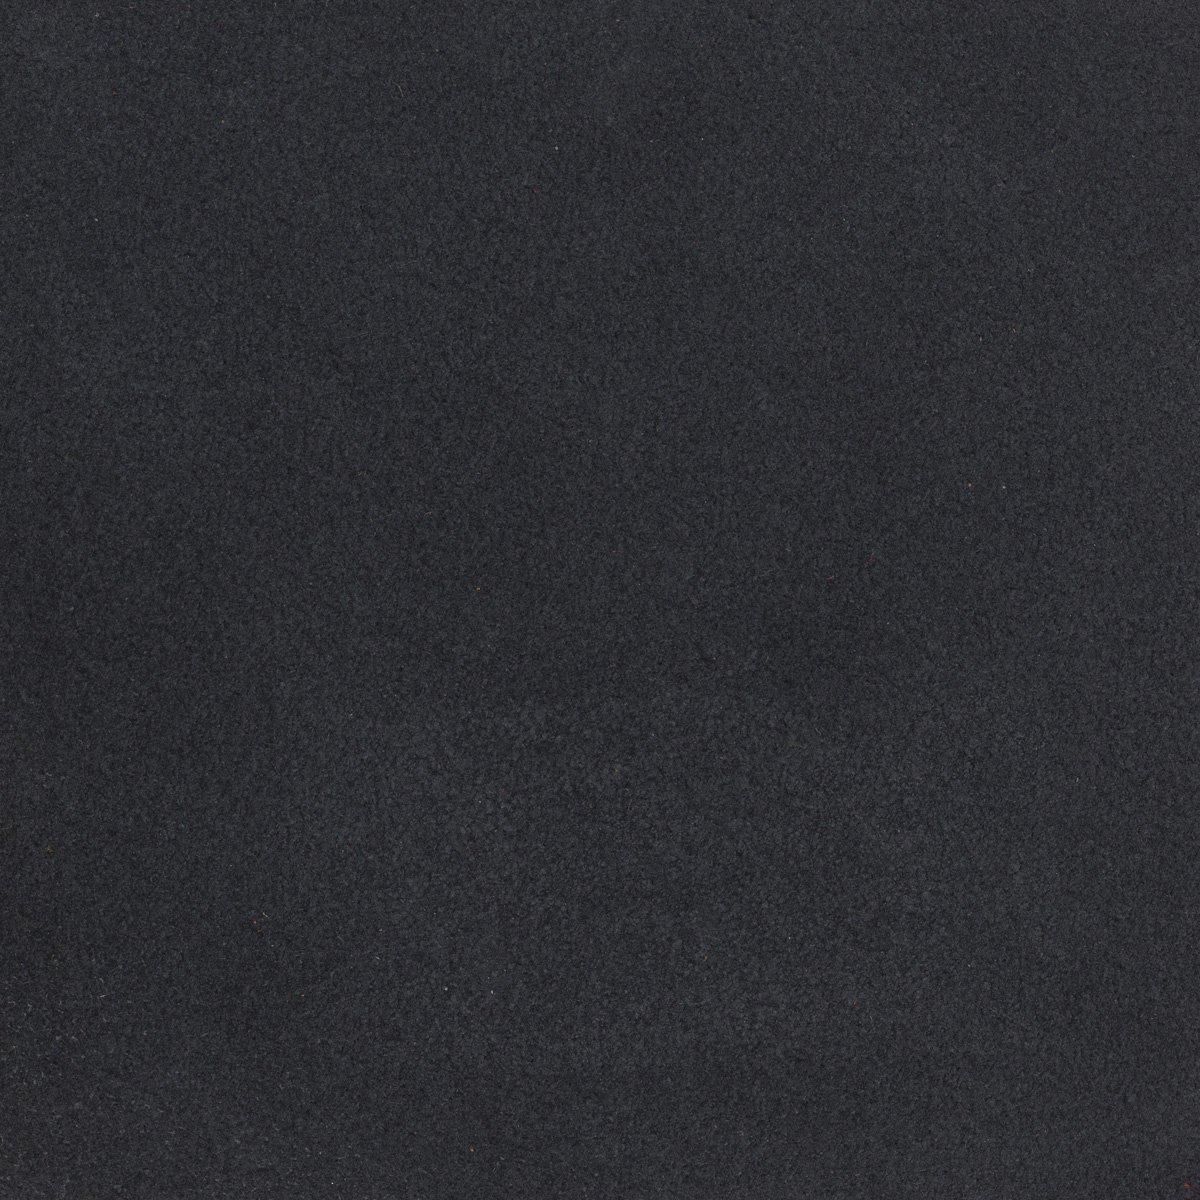 J.FitzPatrick Footwear Charcoal Suede